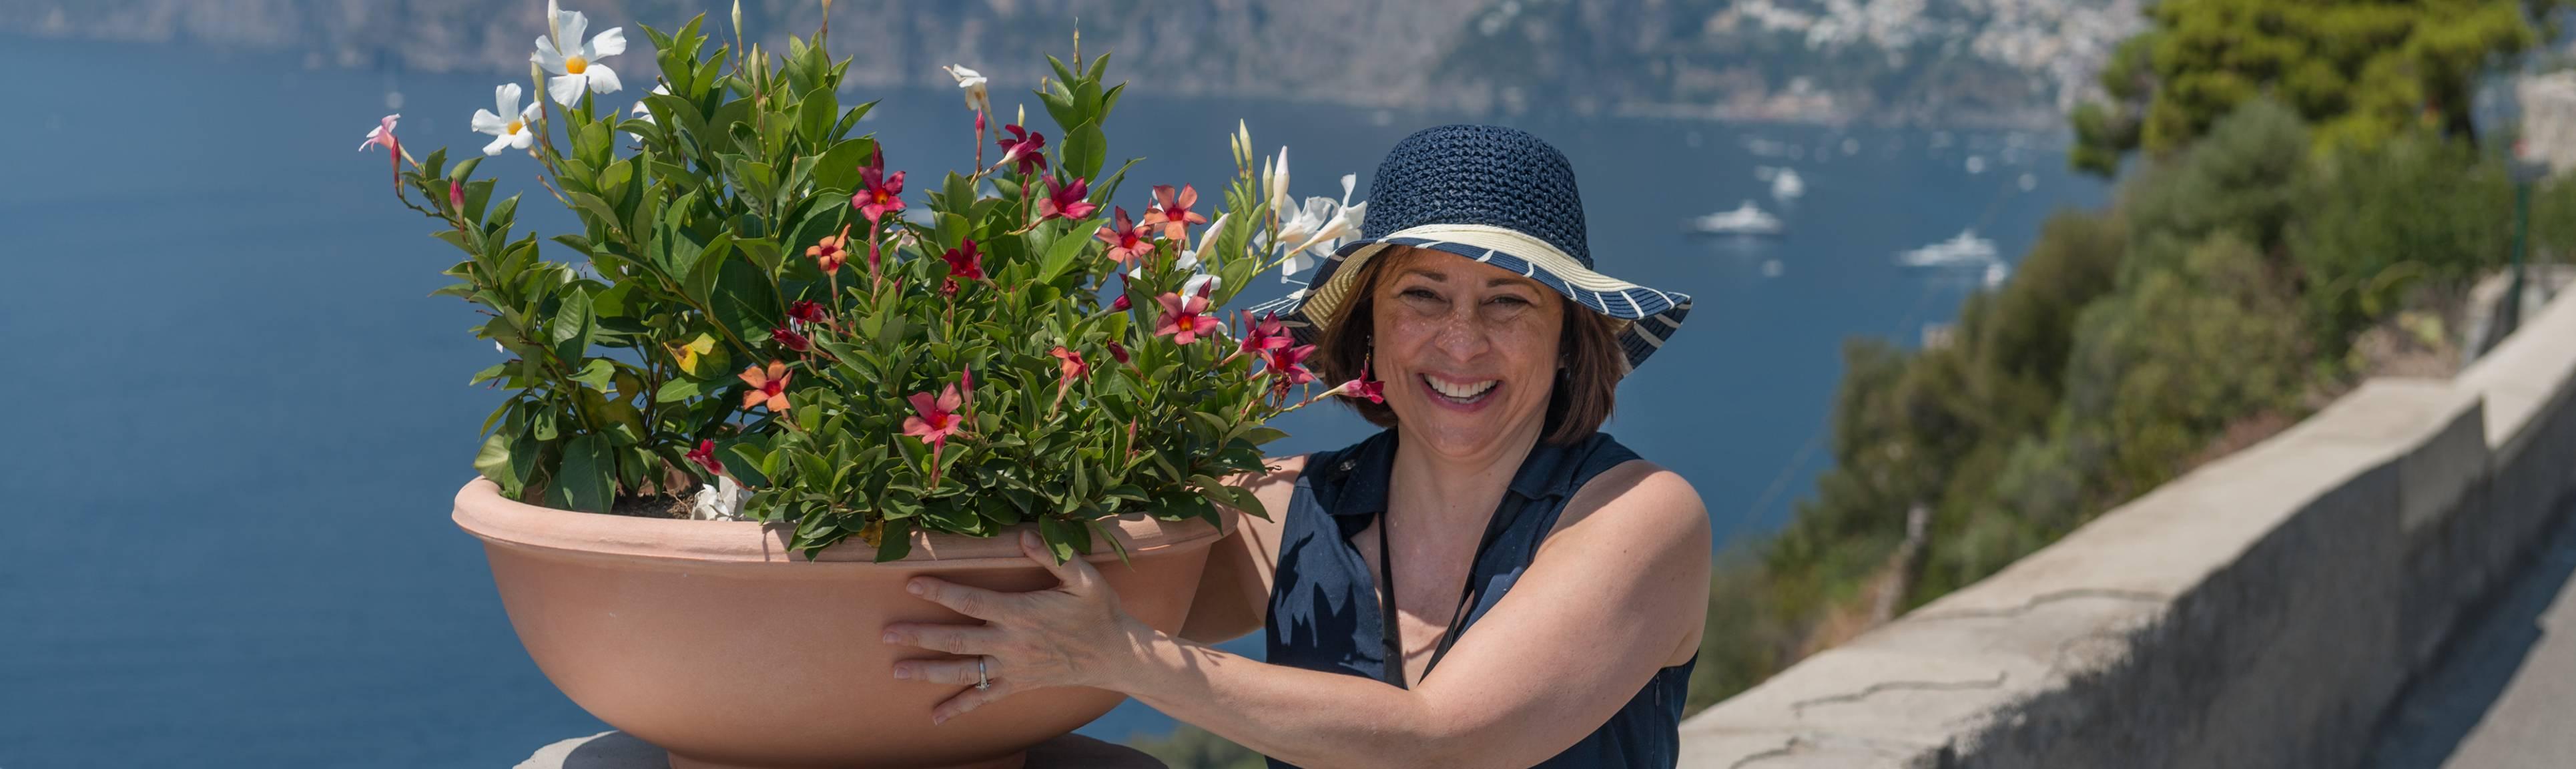 Carmen with urn filled beautiful flowers overlooking the Amalfi Coast